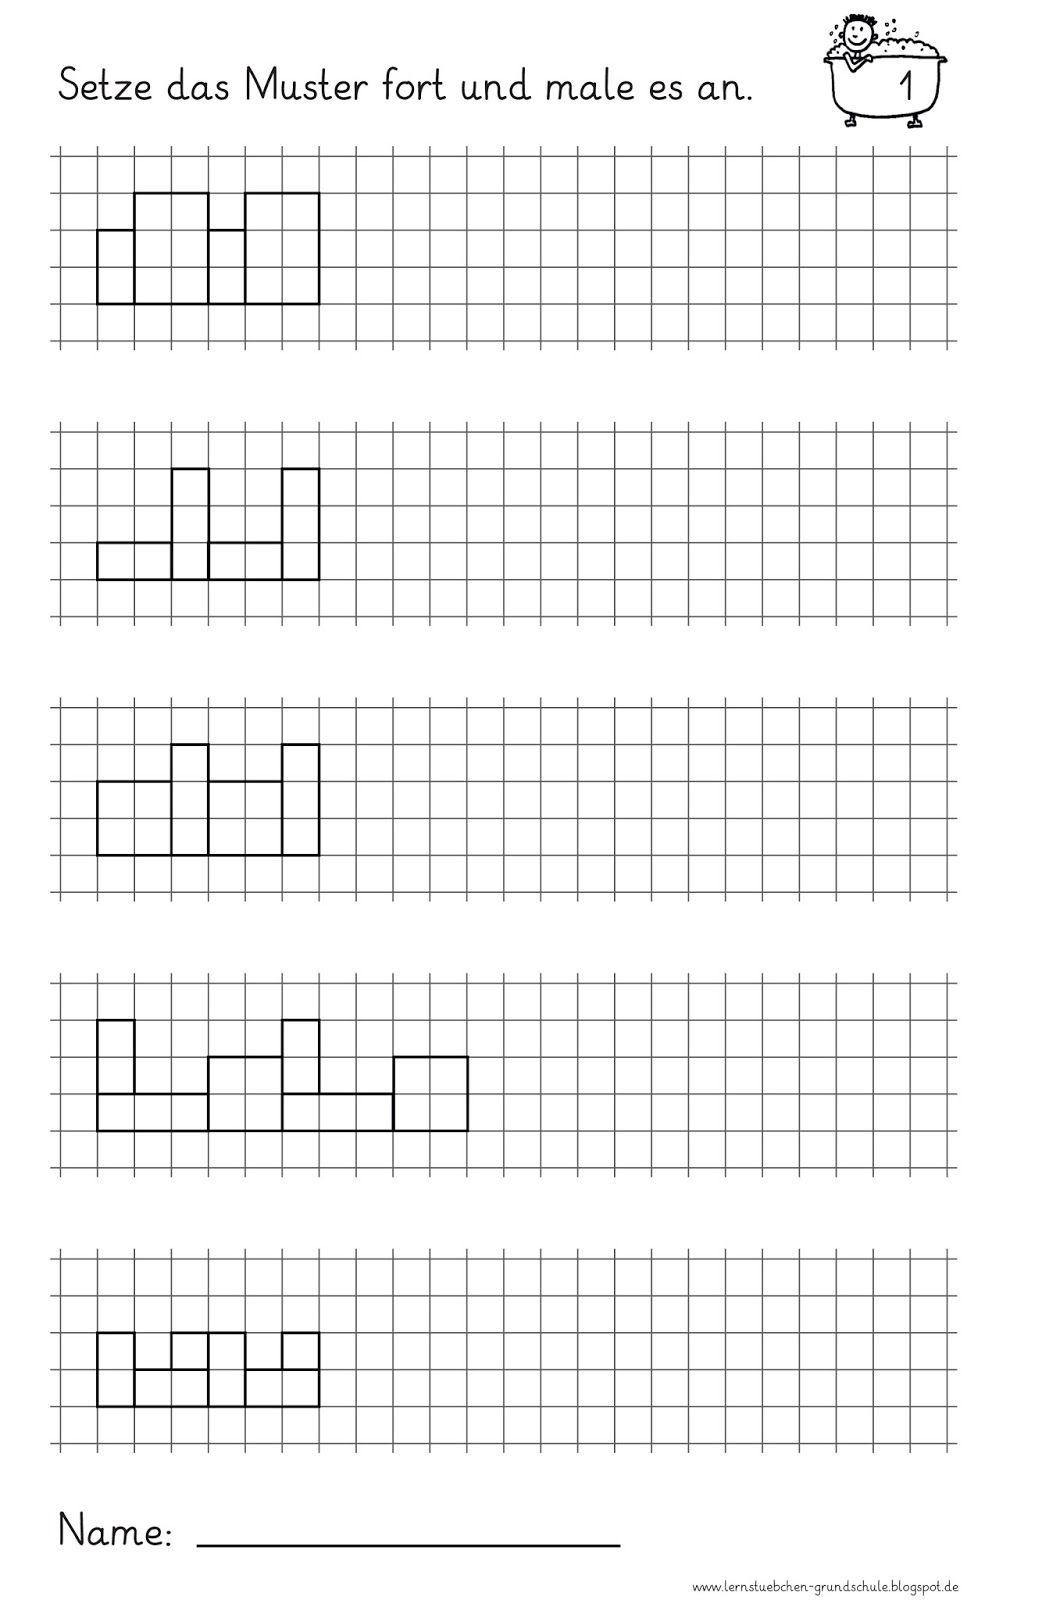 lernst bchen muster fortsetzen und anmalen mathe 1 klasse schule arbeitsbl tter vorschule. Black Bedroom Furniture Sets. Home Design Ideas